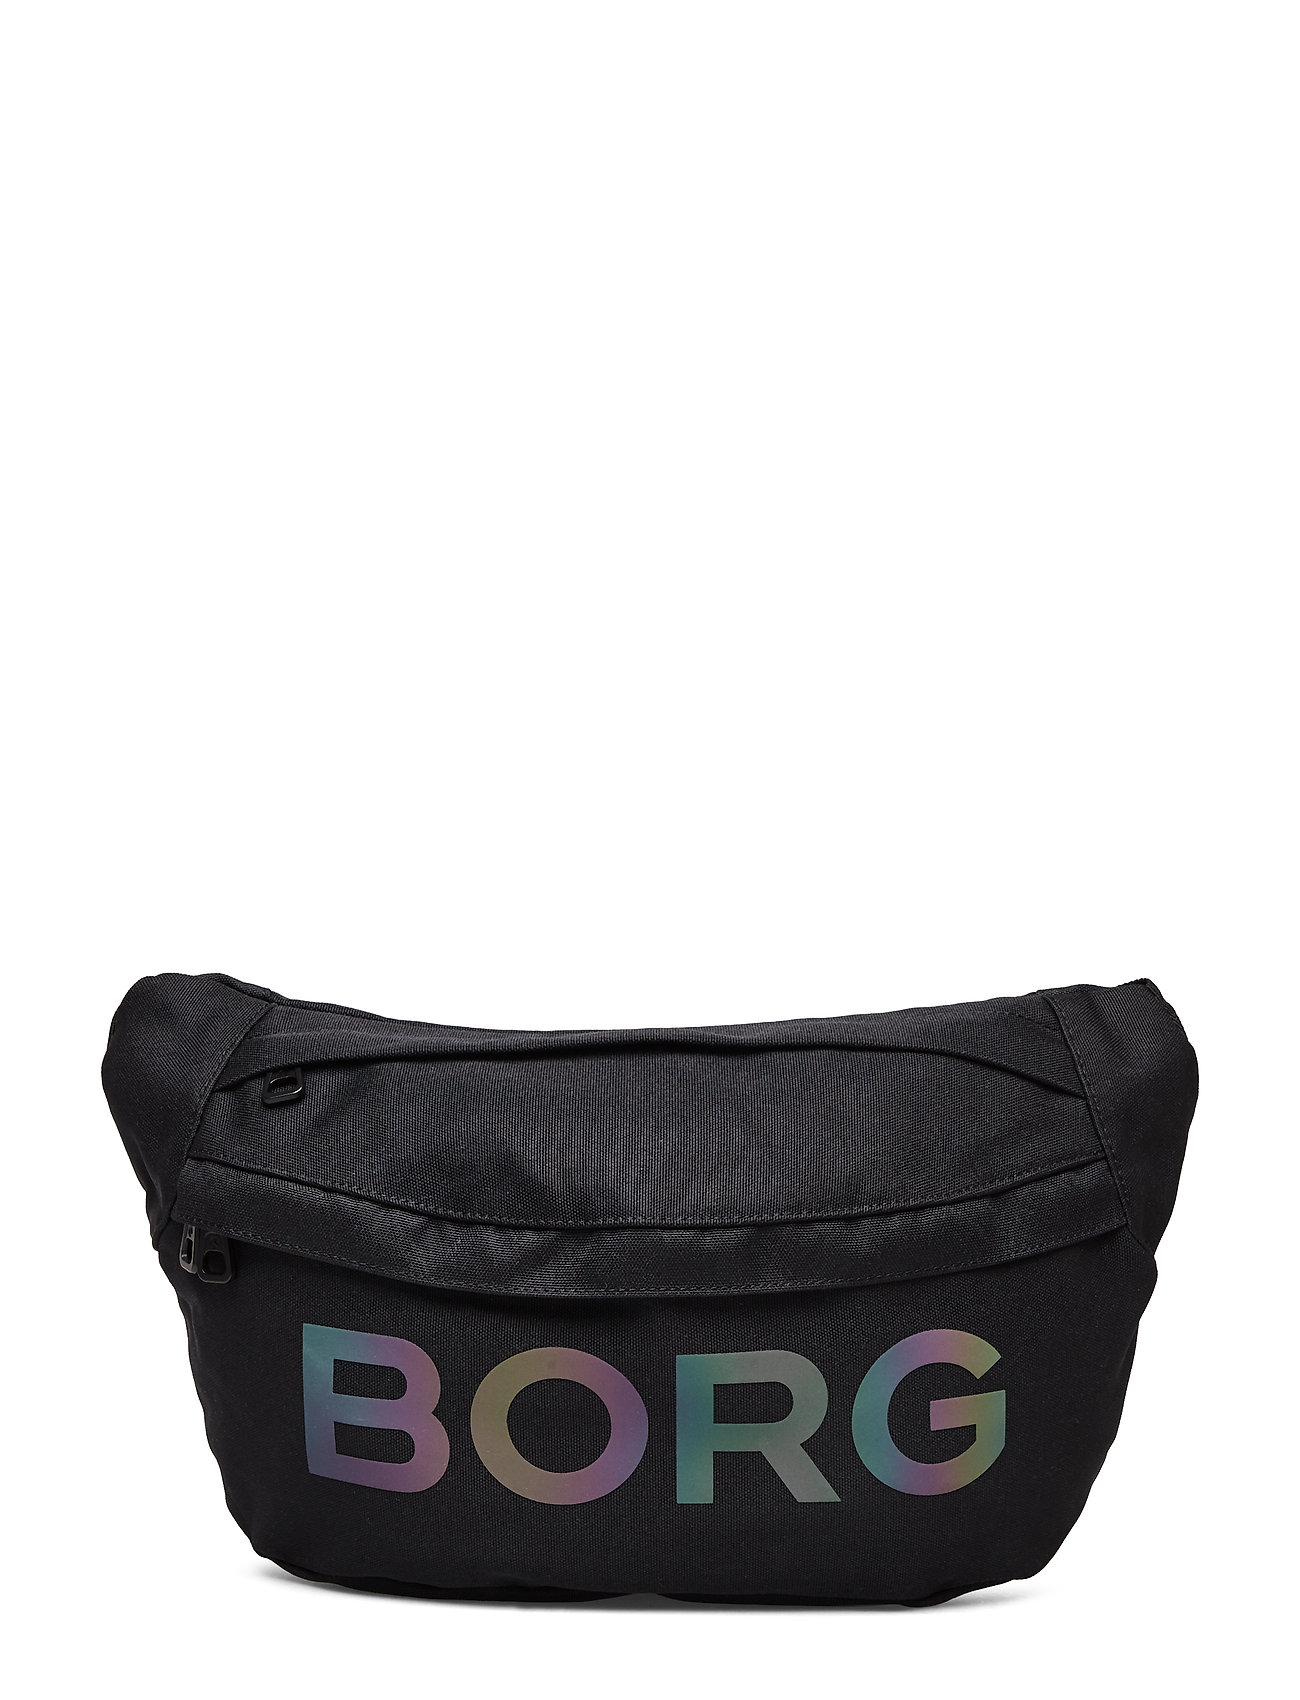 Björn Borg Bags VANESSA - BLACK